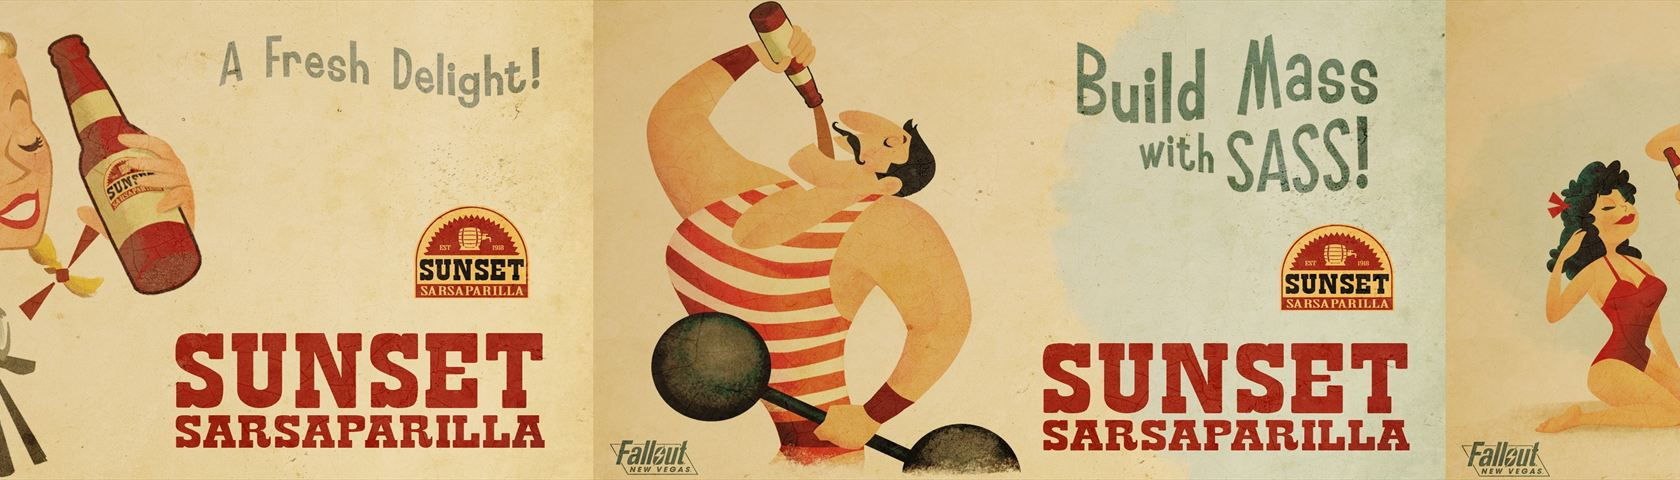 Fallout: Sunset Sarsaparilla Posters